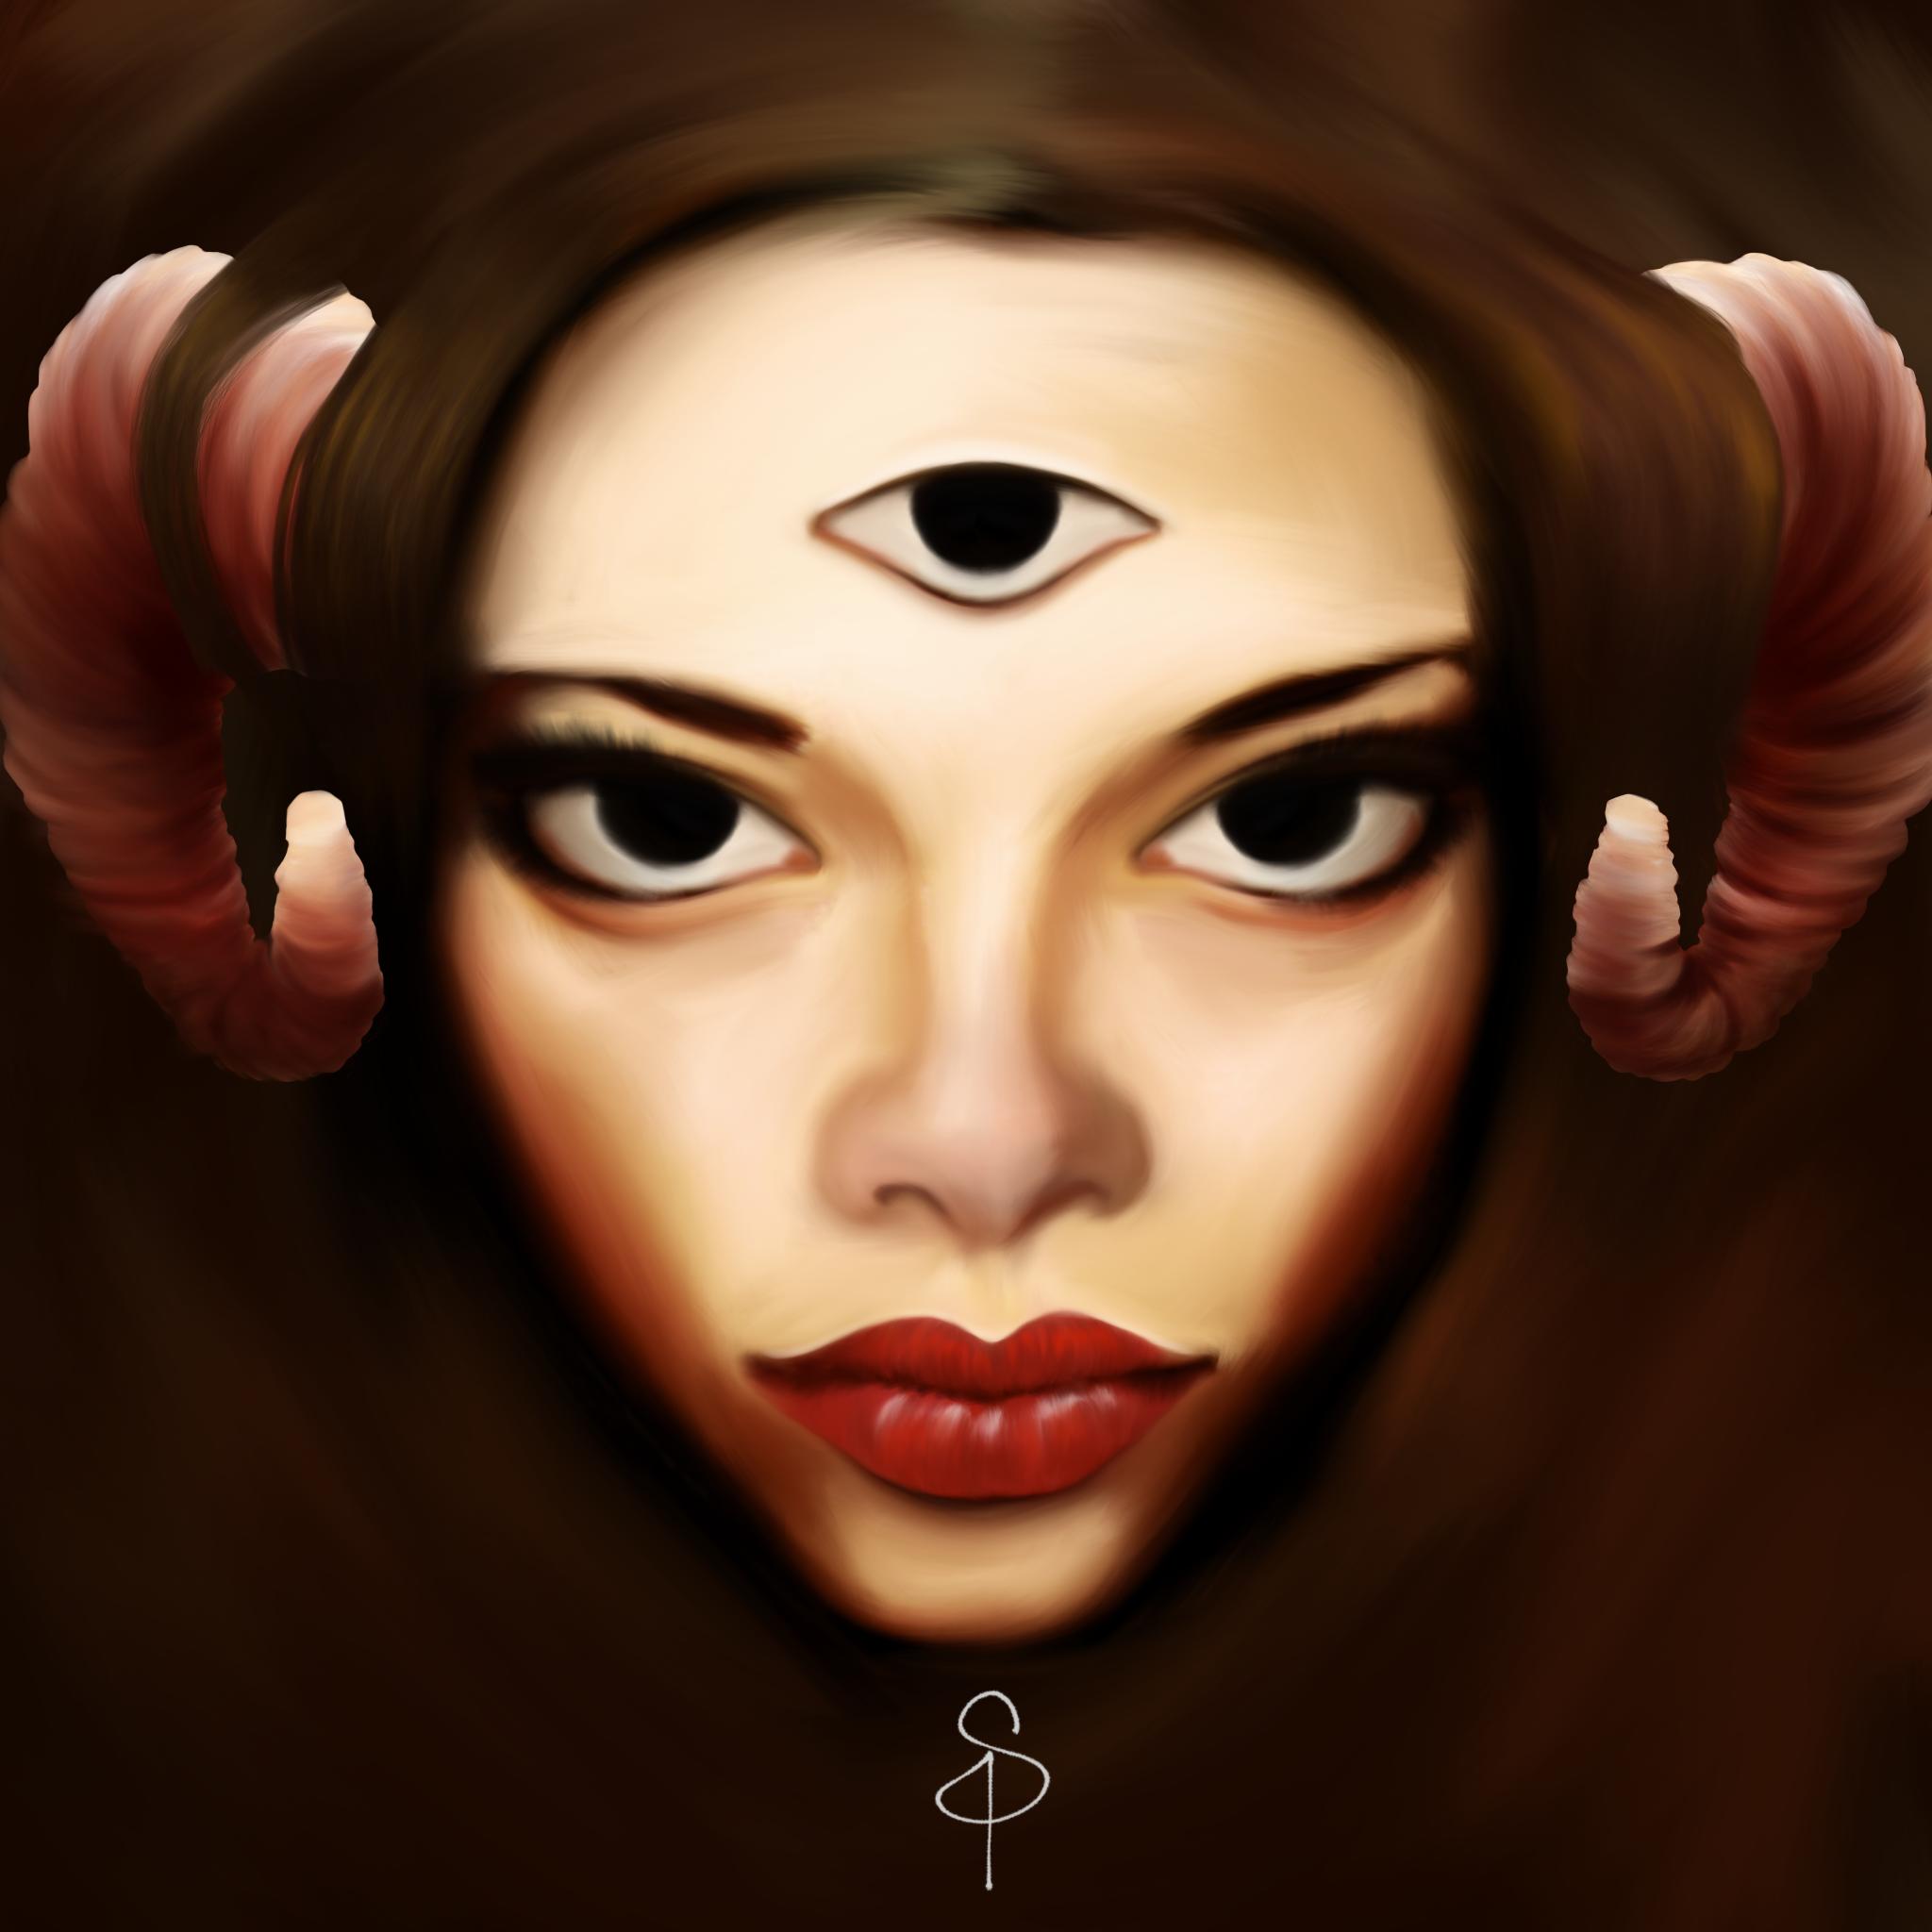 Face by SangrePrimitiva